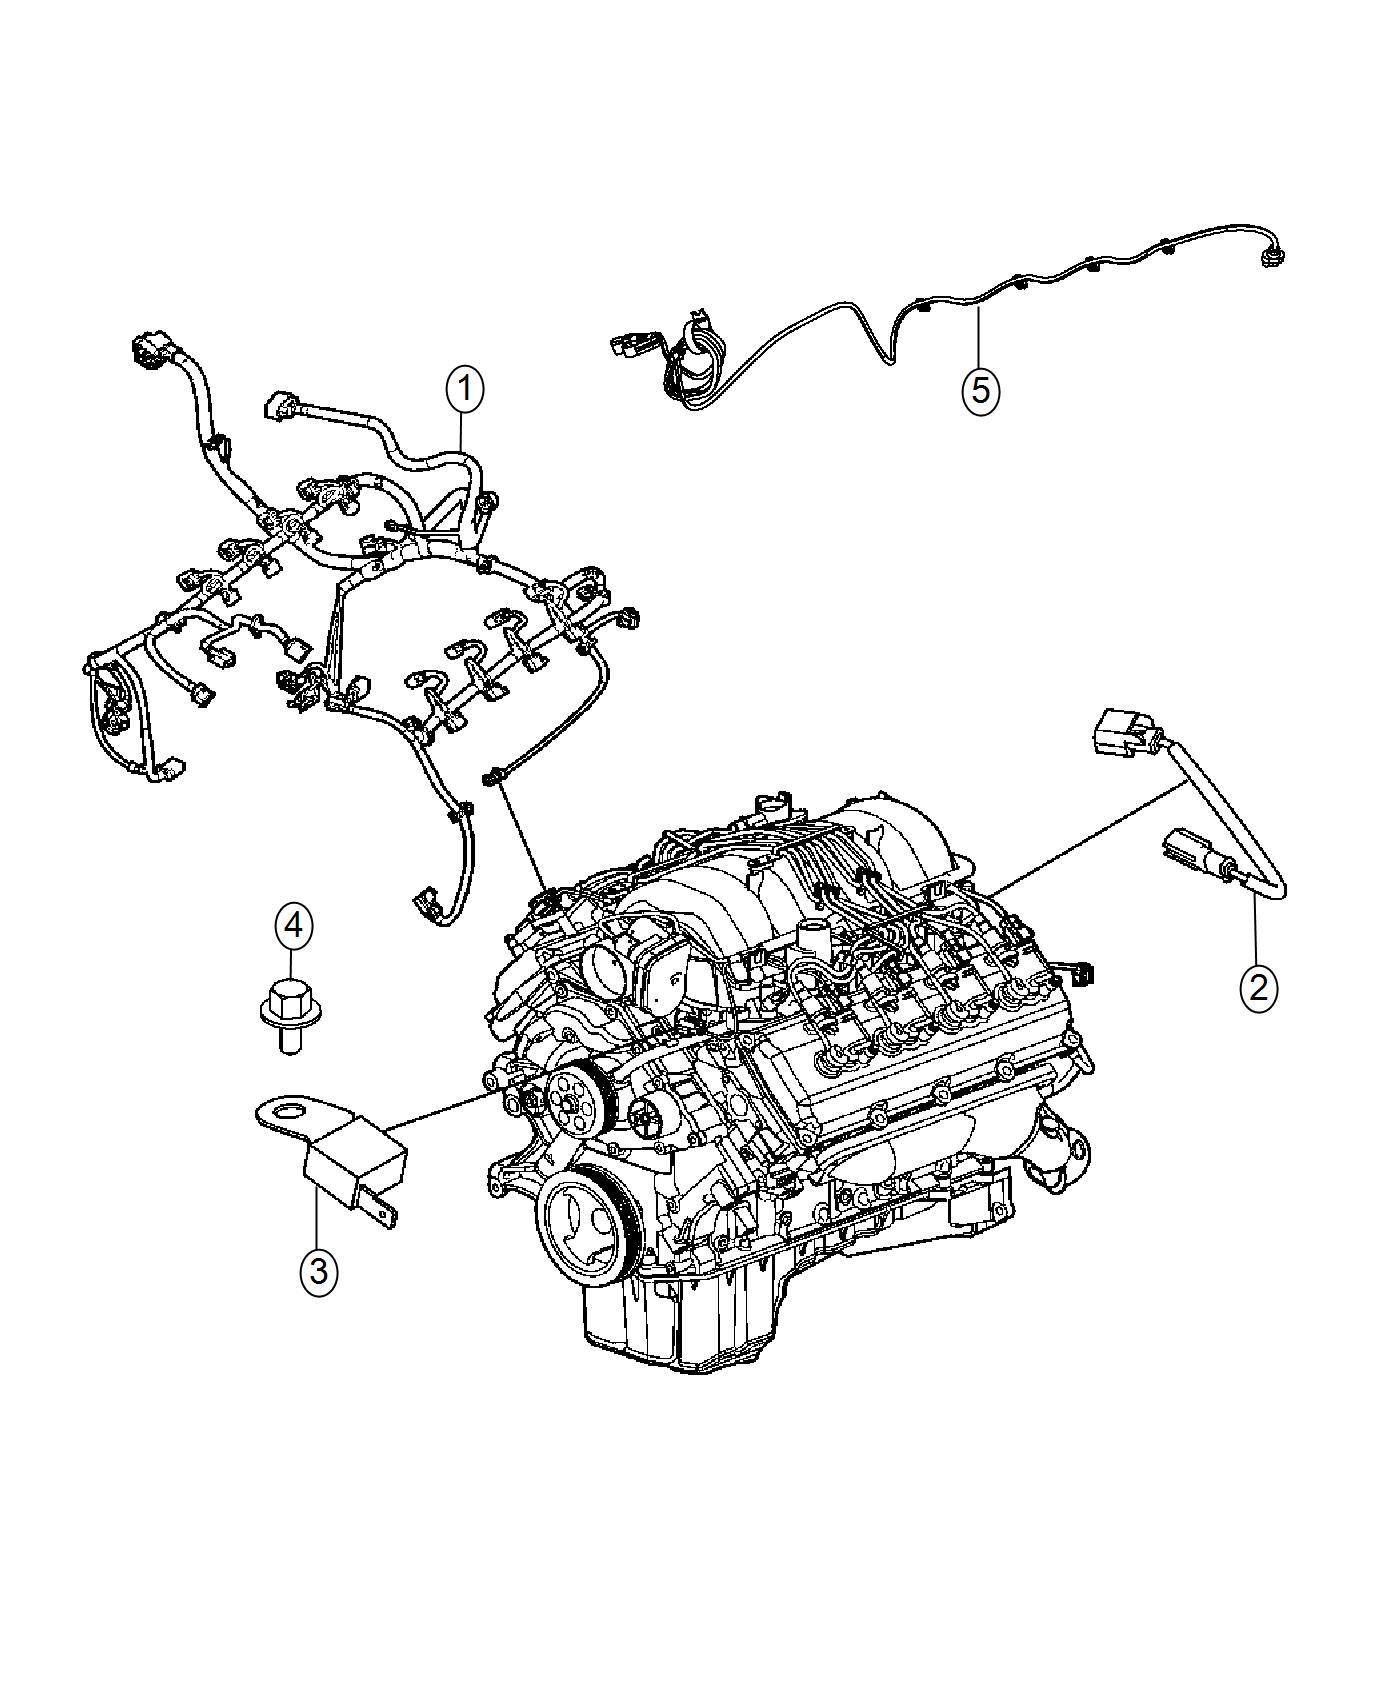 Chrysler 300 Wiring Engine Powertrain Mopar Electrical